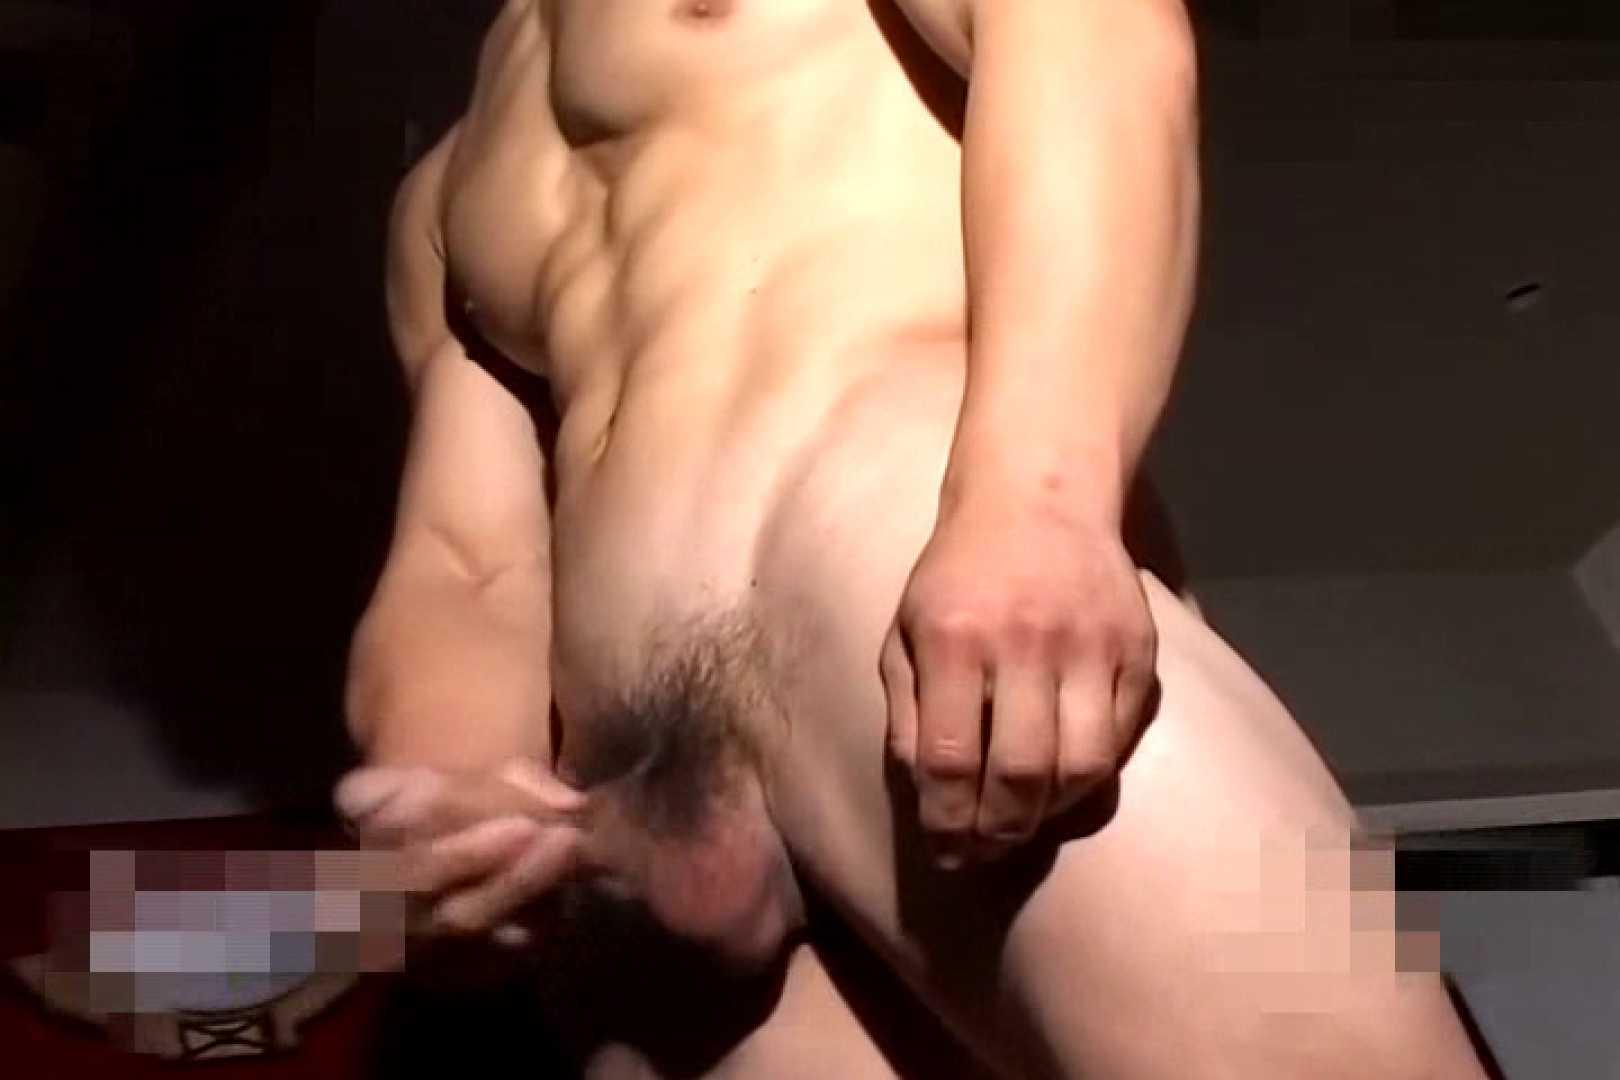 Beautiful muscle モッコリ野郎達!Vol.06 フェチ ちんこ画像 90枚 26